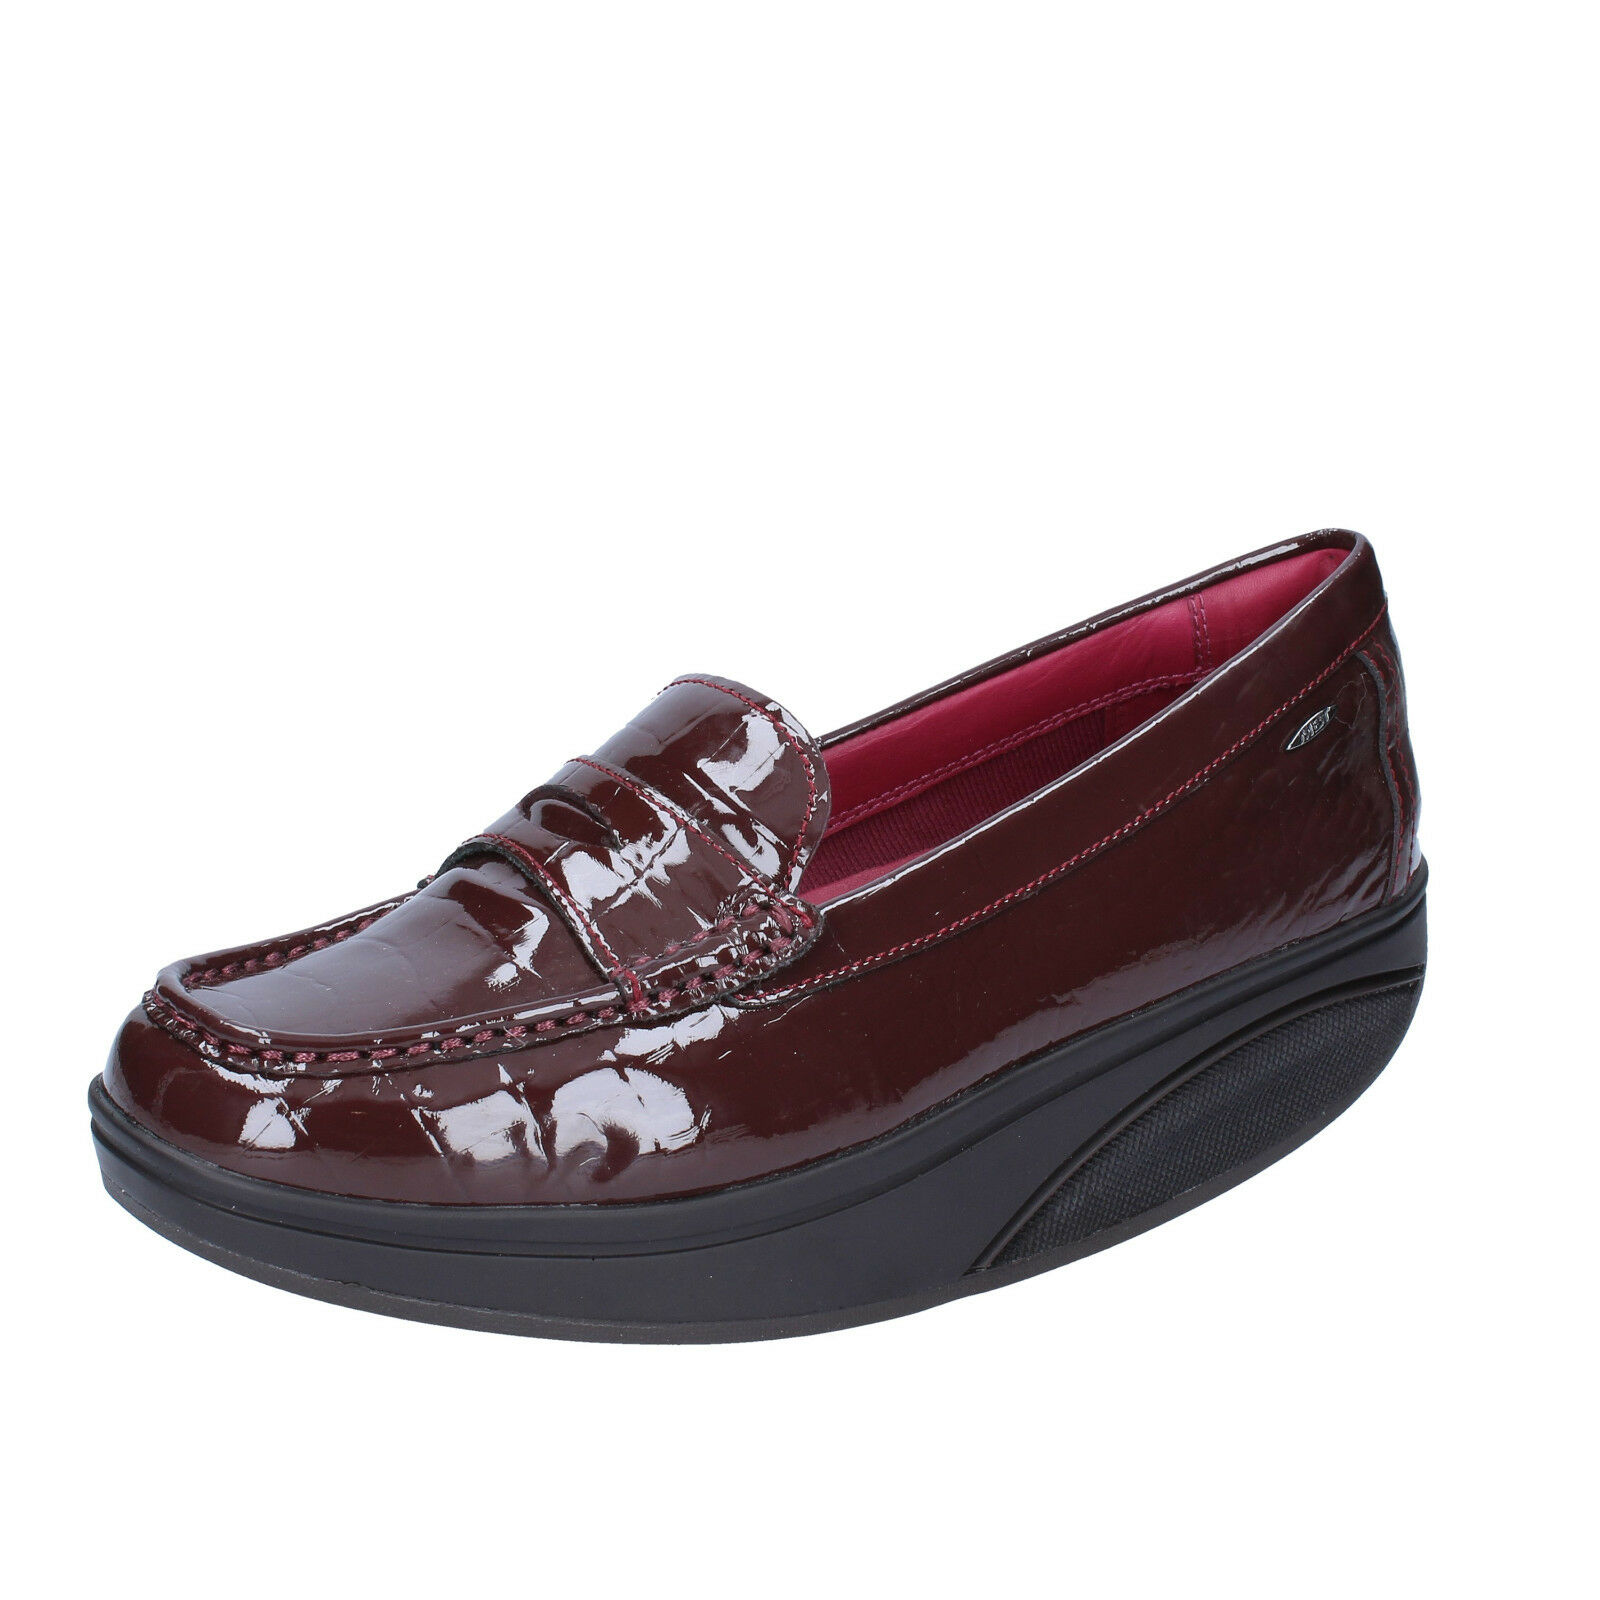 mujer zapatos MBT 5 (EU 38) loafers burgundy patent leather dynamic BZ917-C